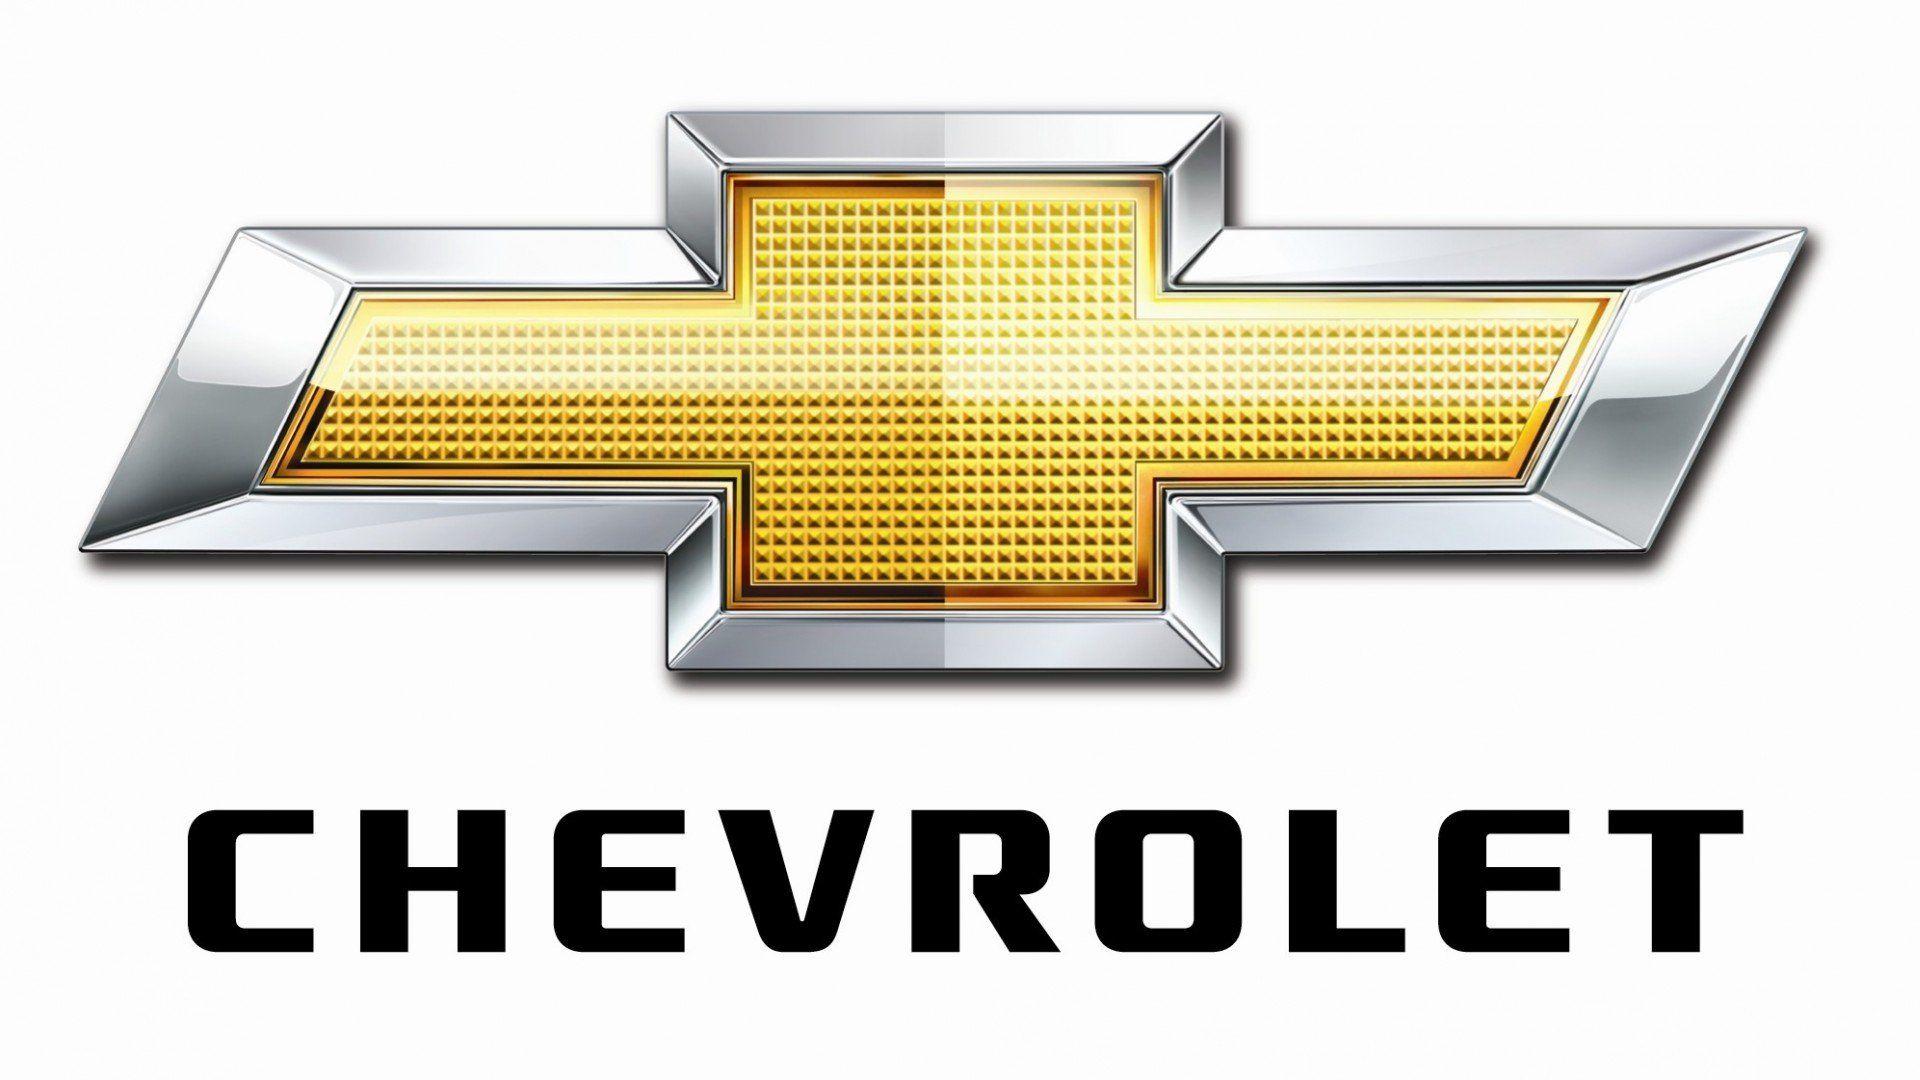 Chevrolet logo wallpaper hd 19201080 wallpaper chevrolet chevrolet logo wallpaper hd 19201080 wallpaper buycottarizona Images